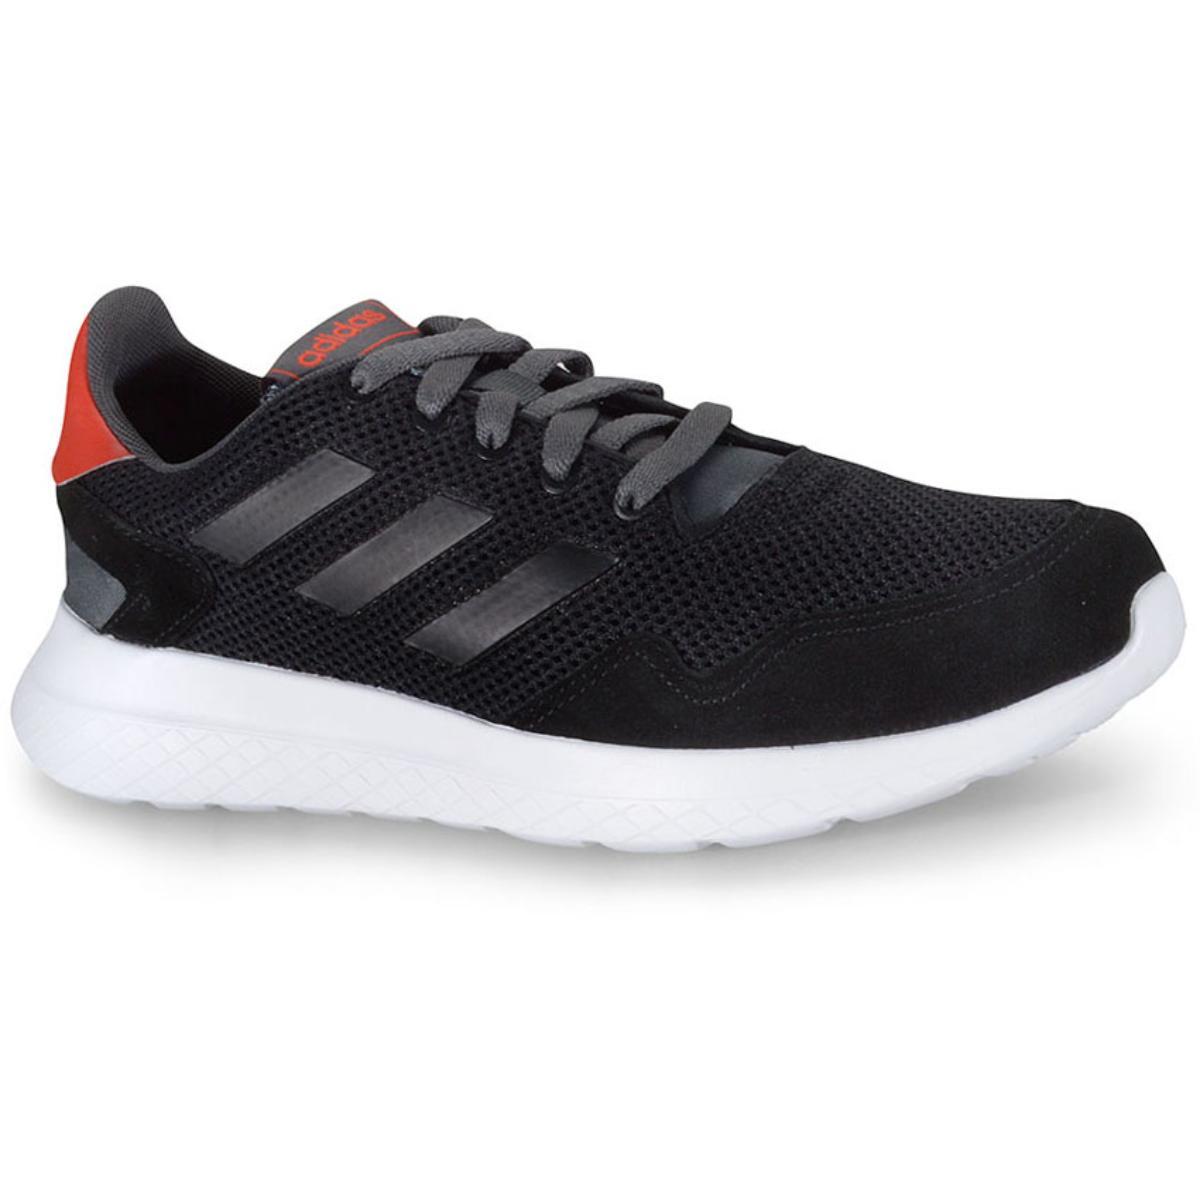 Tênis Masculino Adidas Ef0436 Archivo m Preto/branco